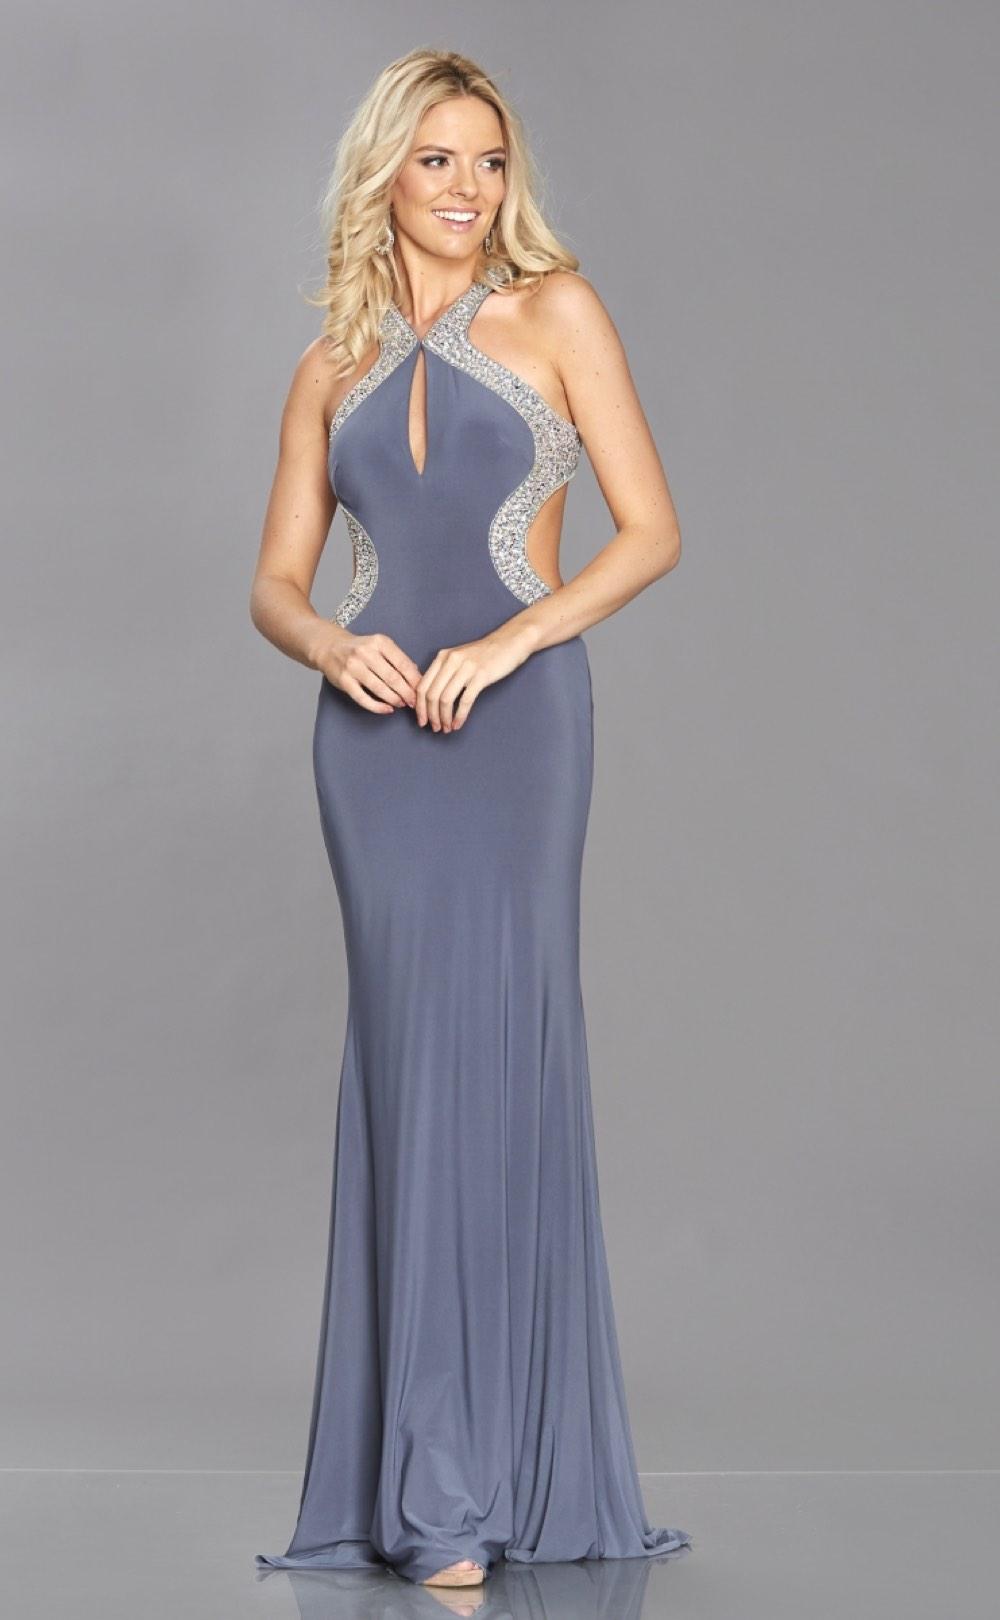 812339e6f26 Sophisticated Prom Dresses Uk